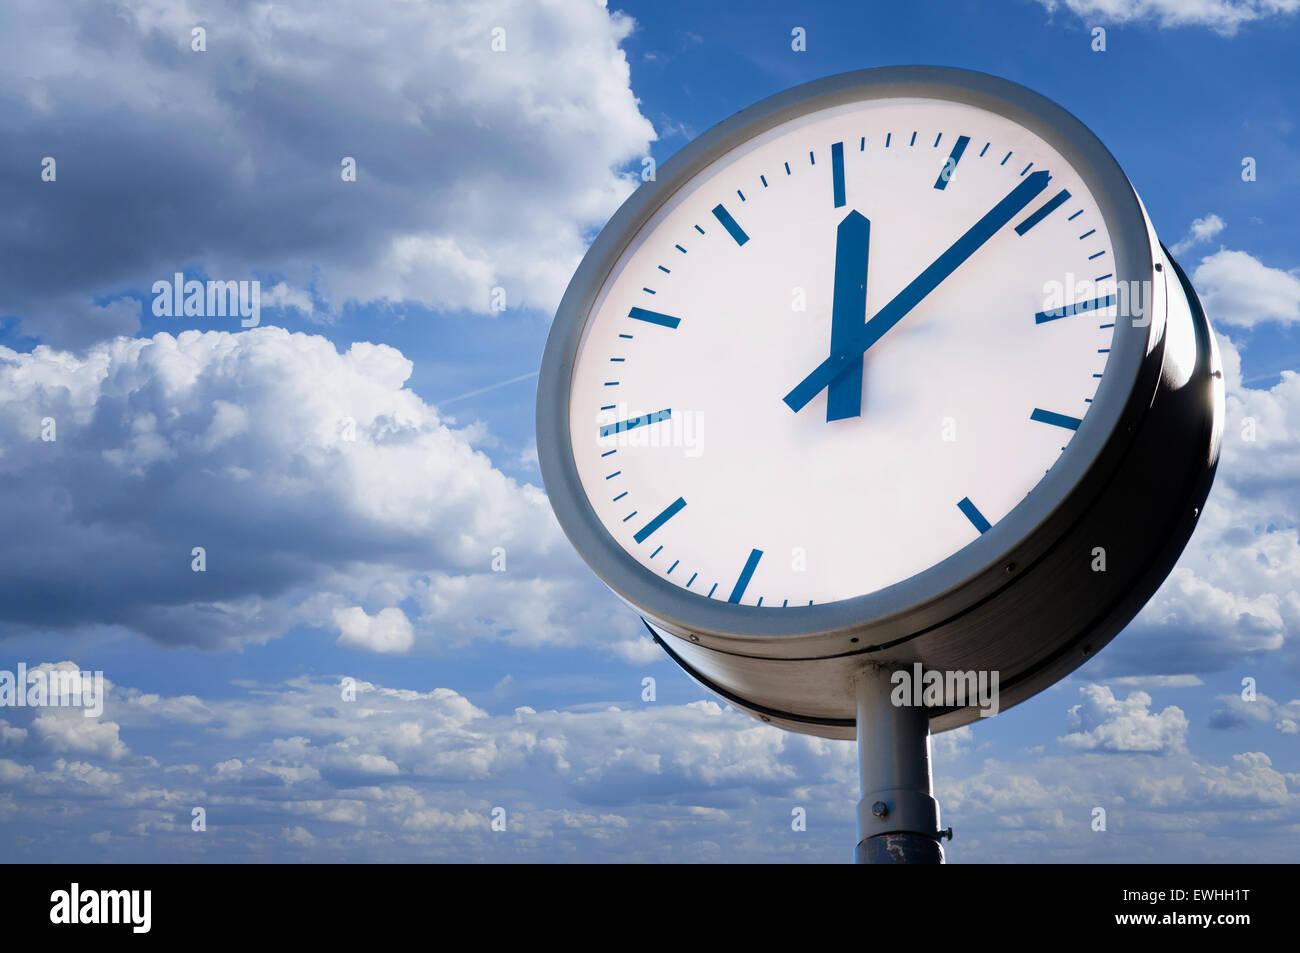 clock - Stock Image